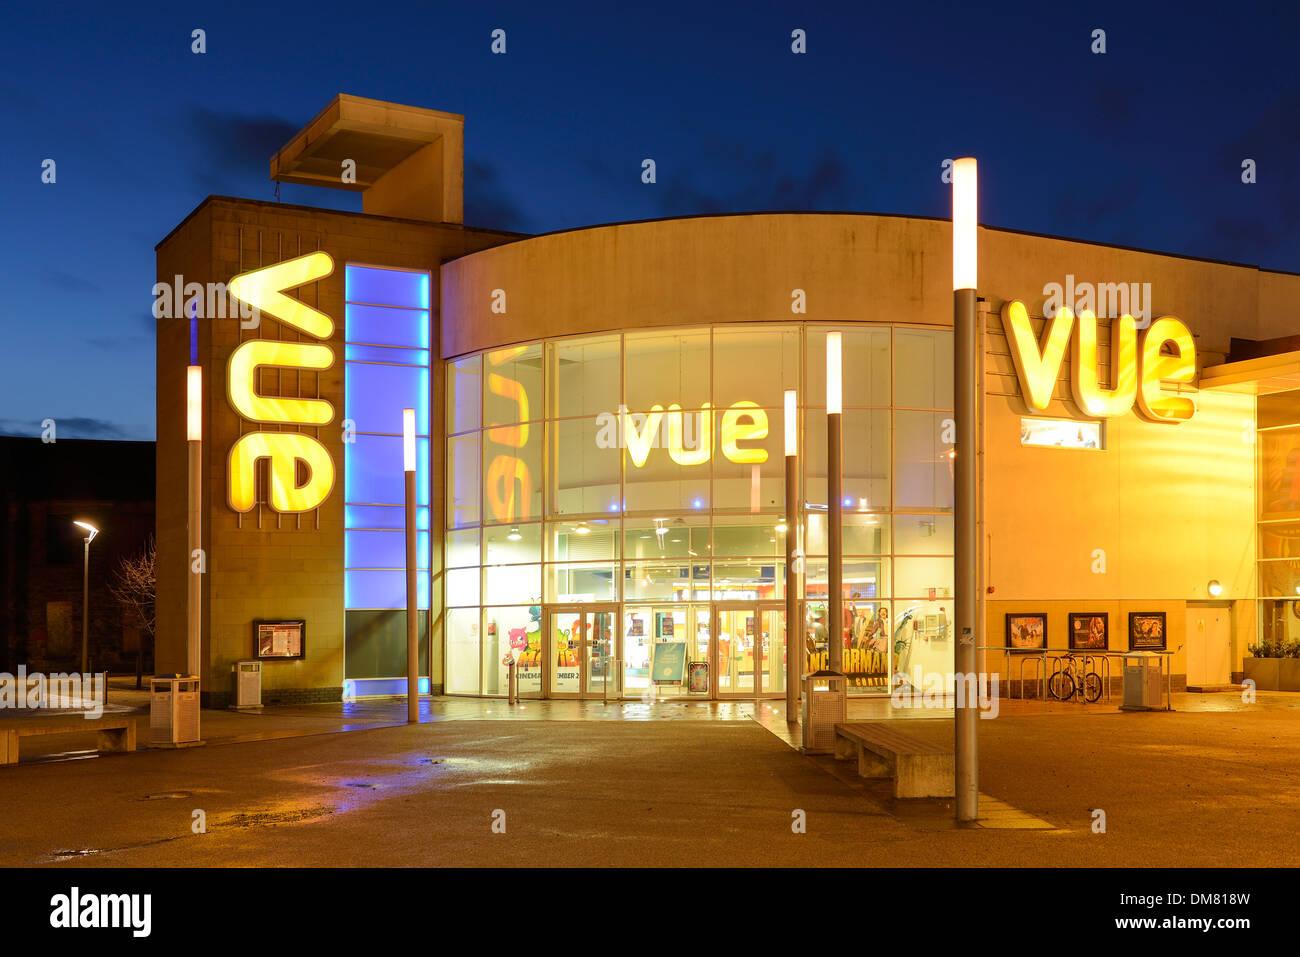 Vue cinema complex in Stirling city centre Scotland UK - Stock Image